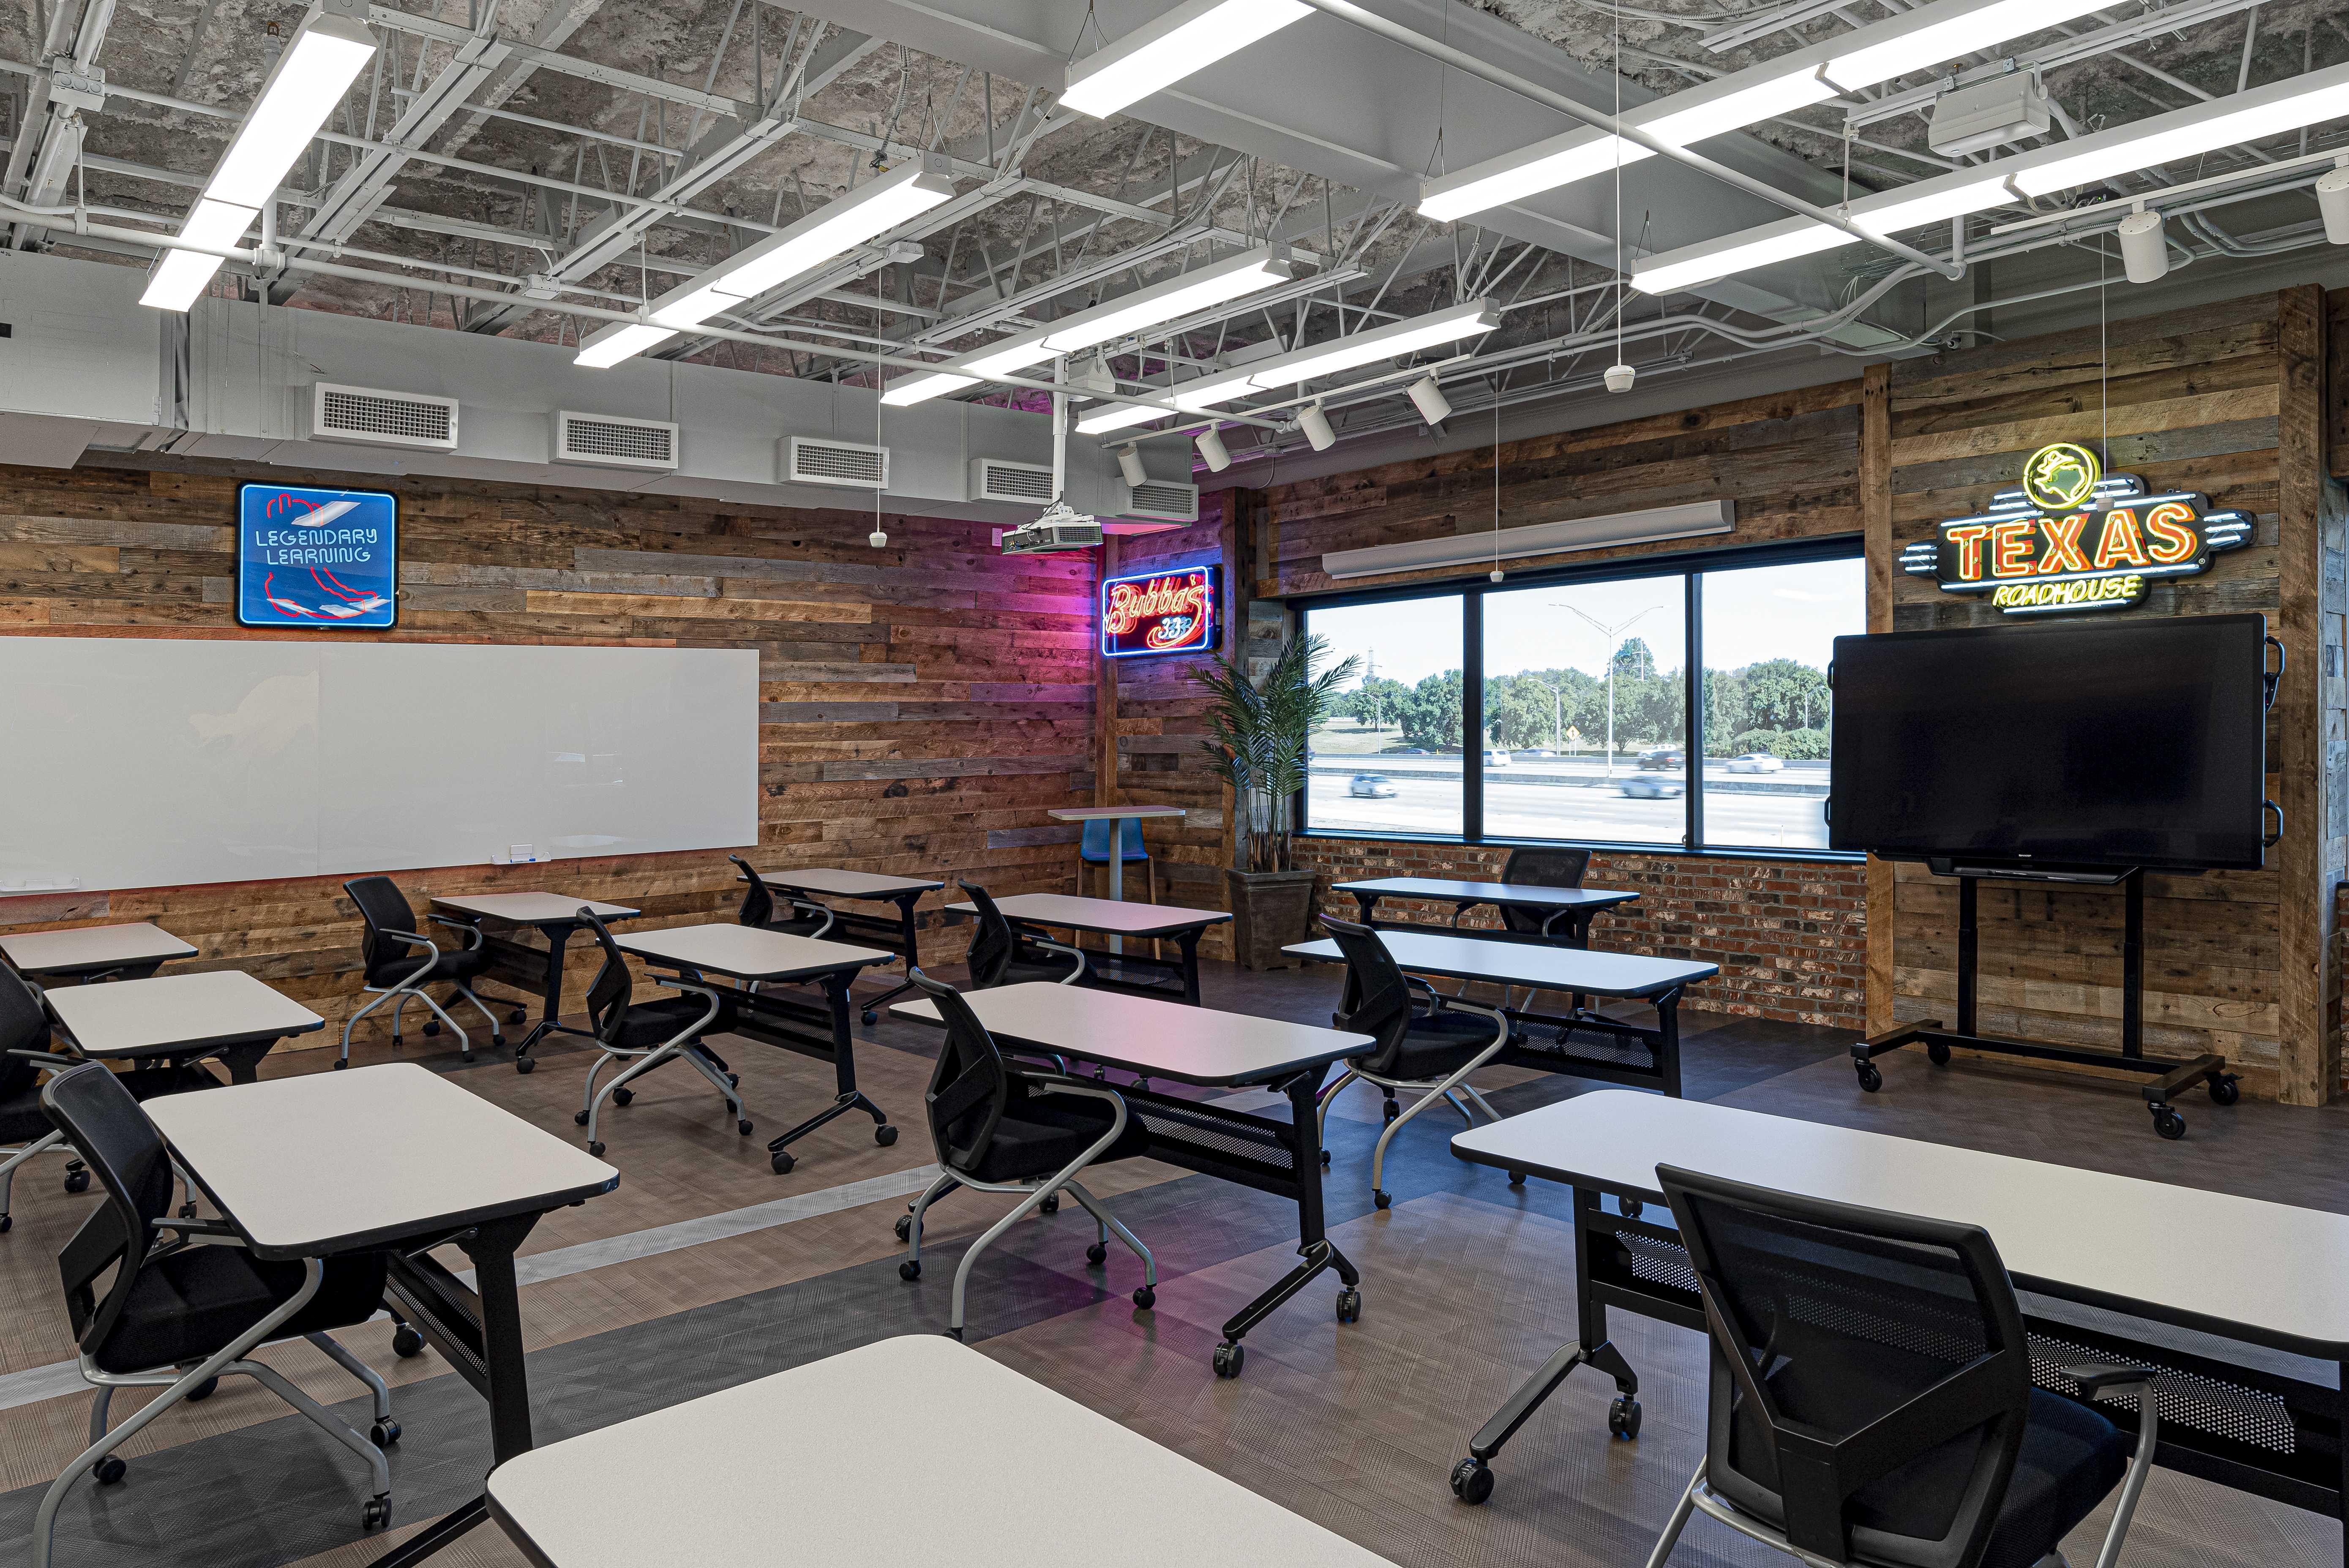 texas-roadhouse-office-classroom